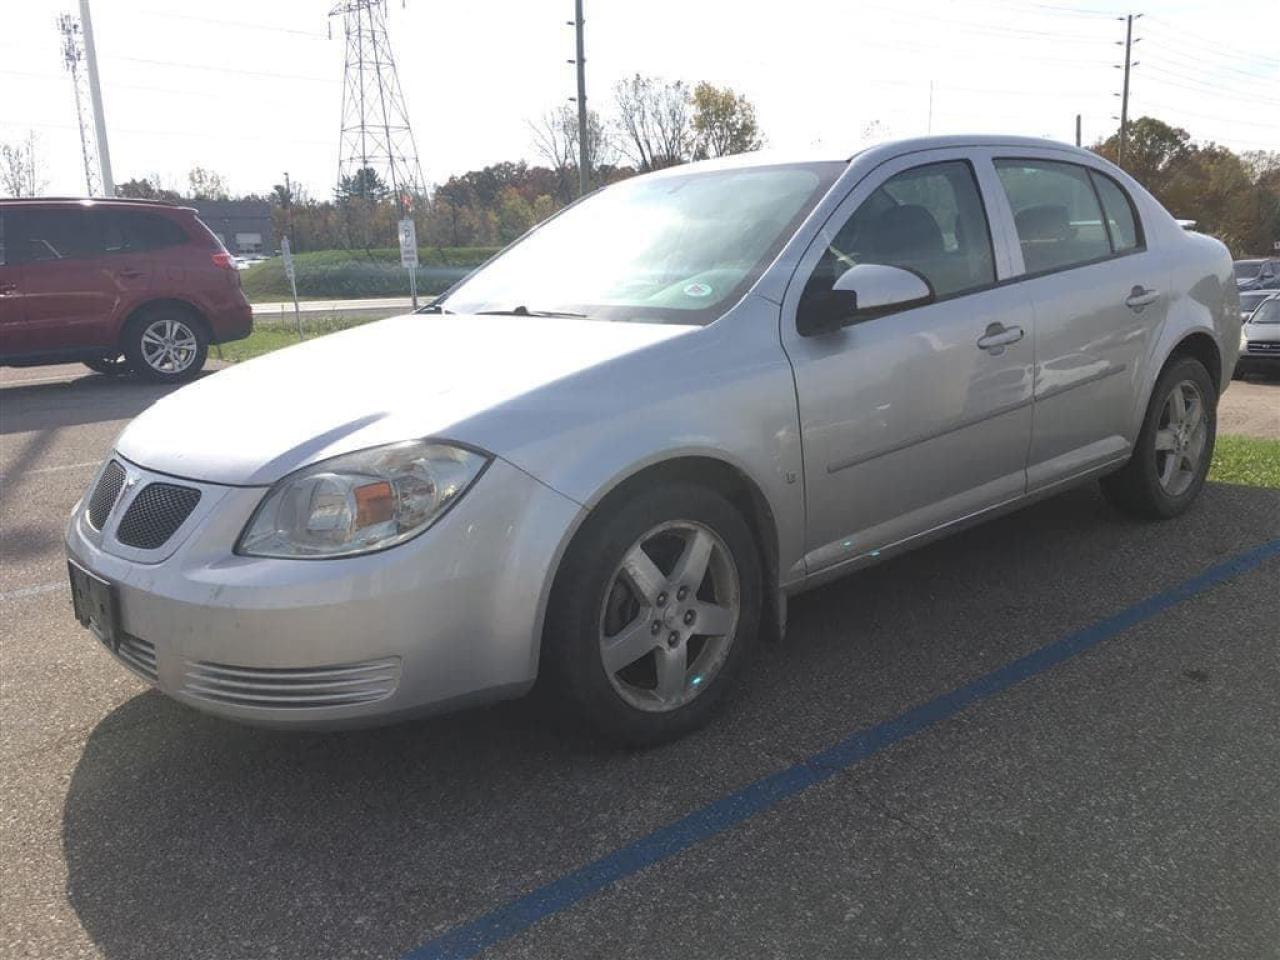 Photo of Gray 2009 Pontiac G5